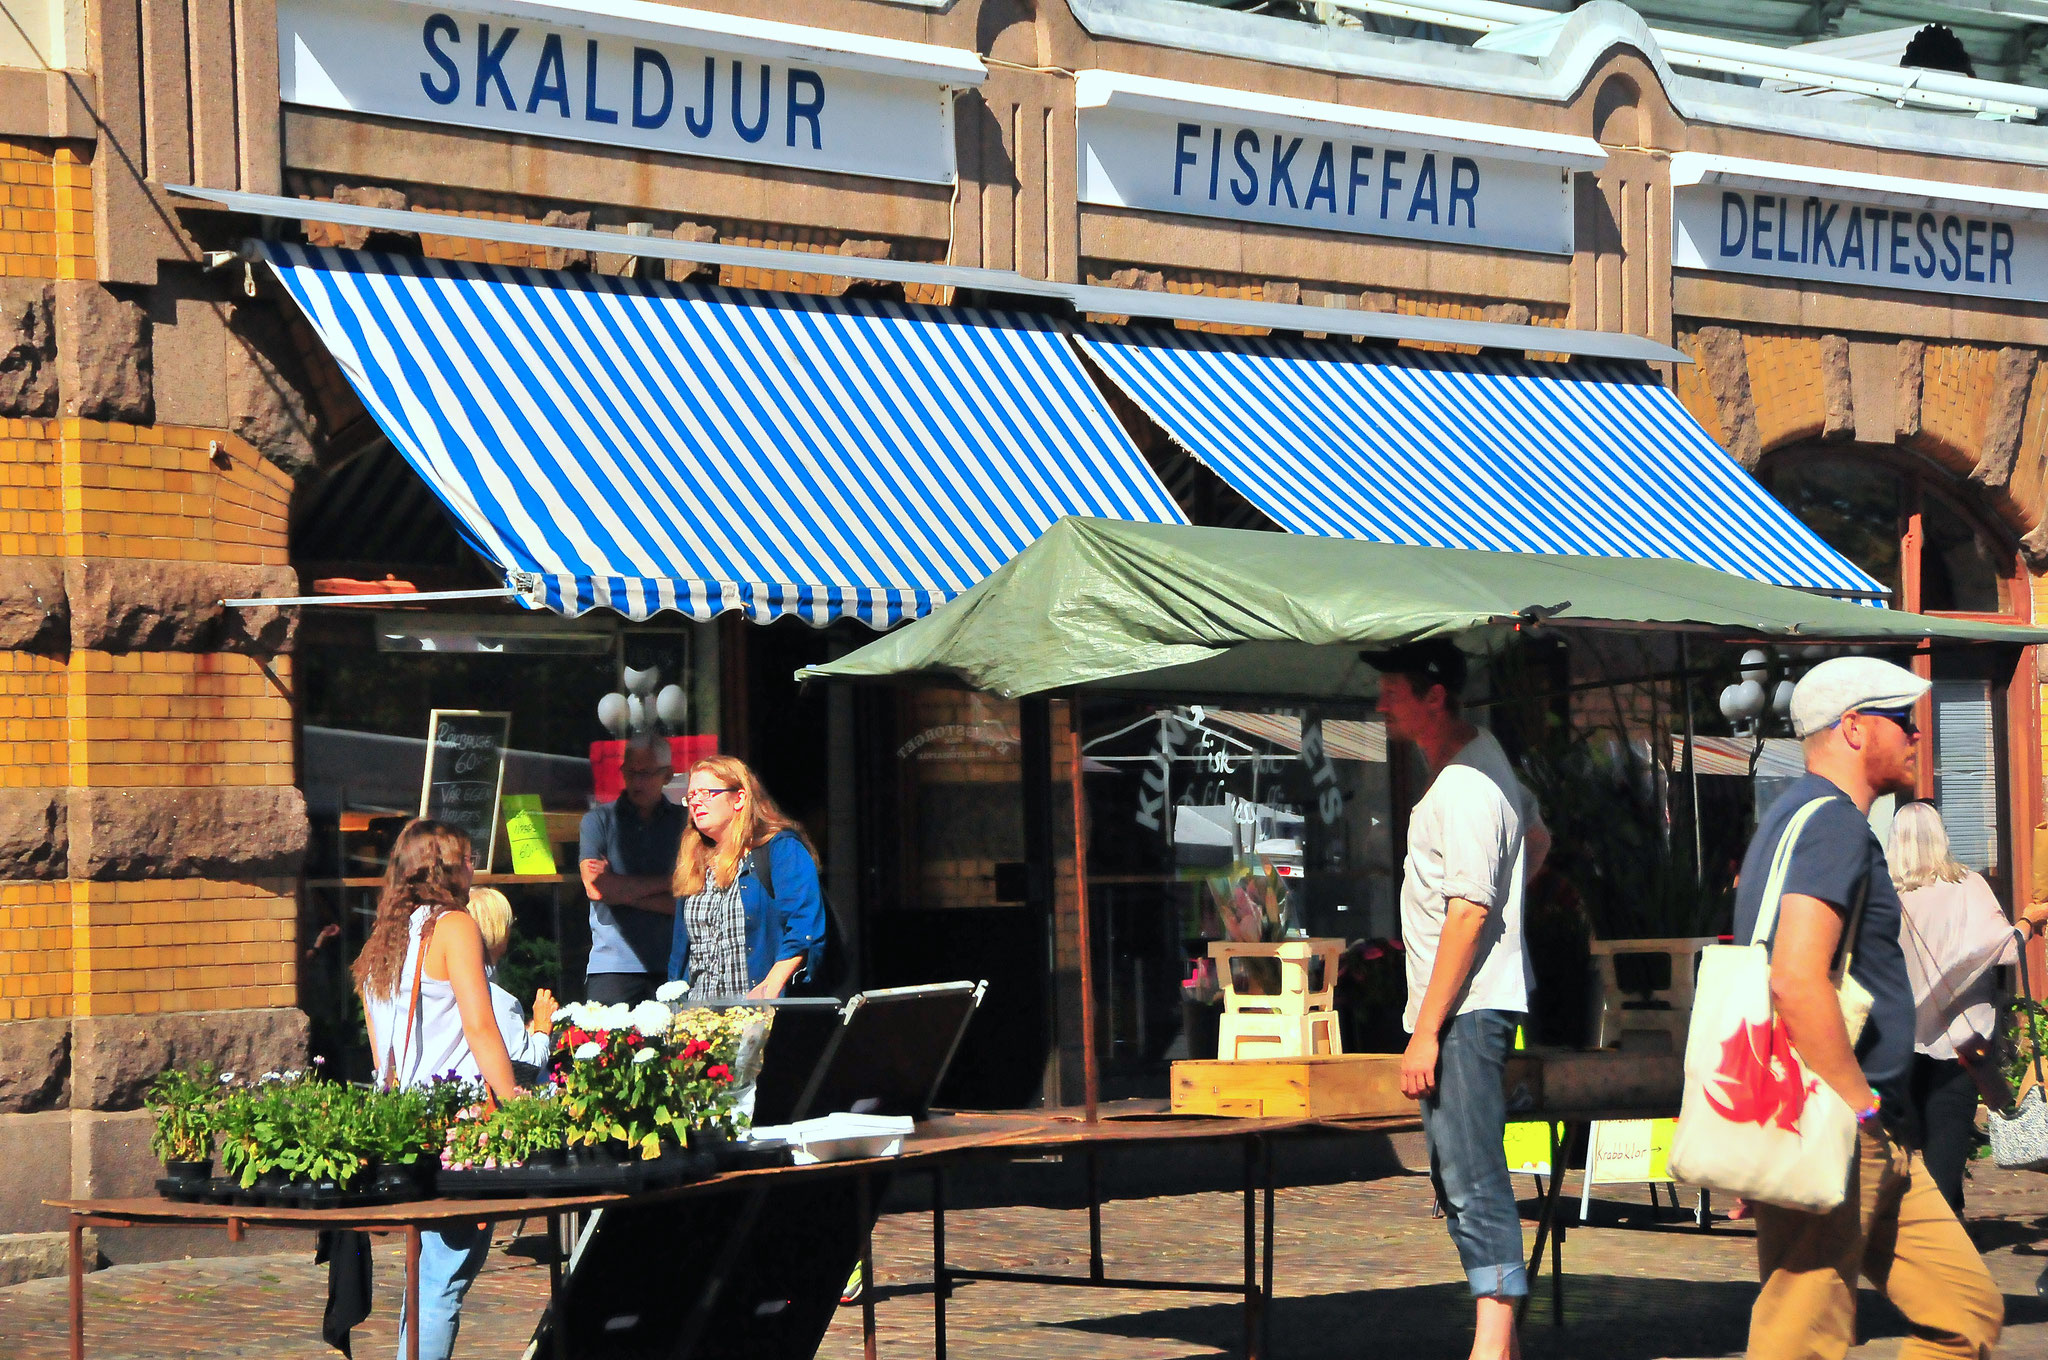 Market Scenery